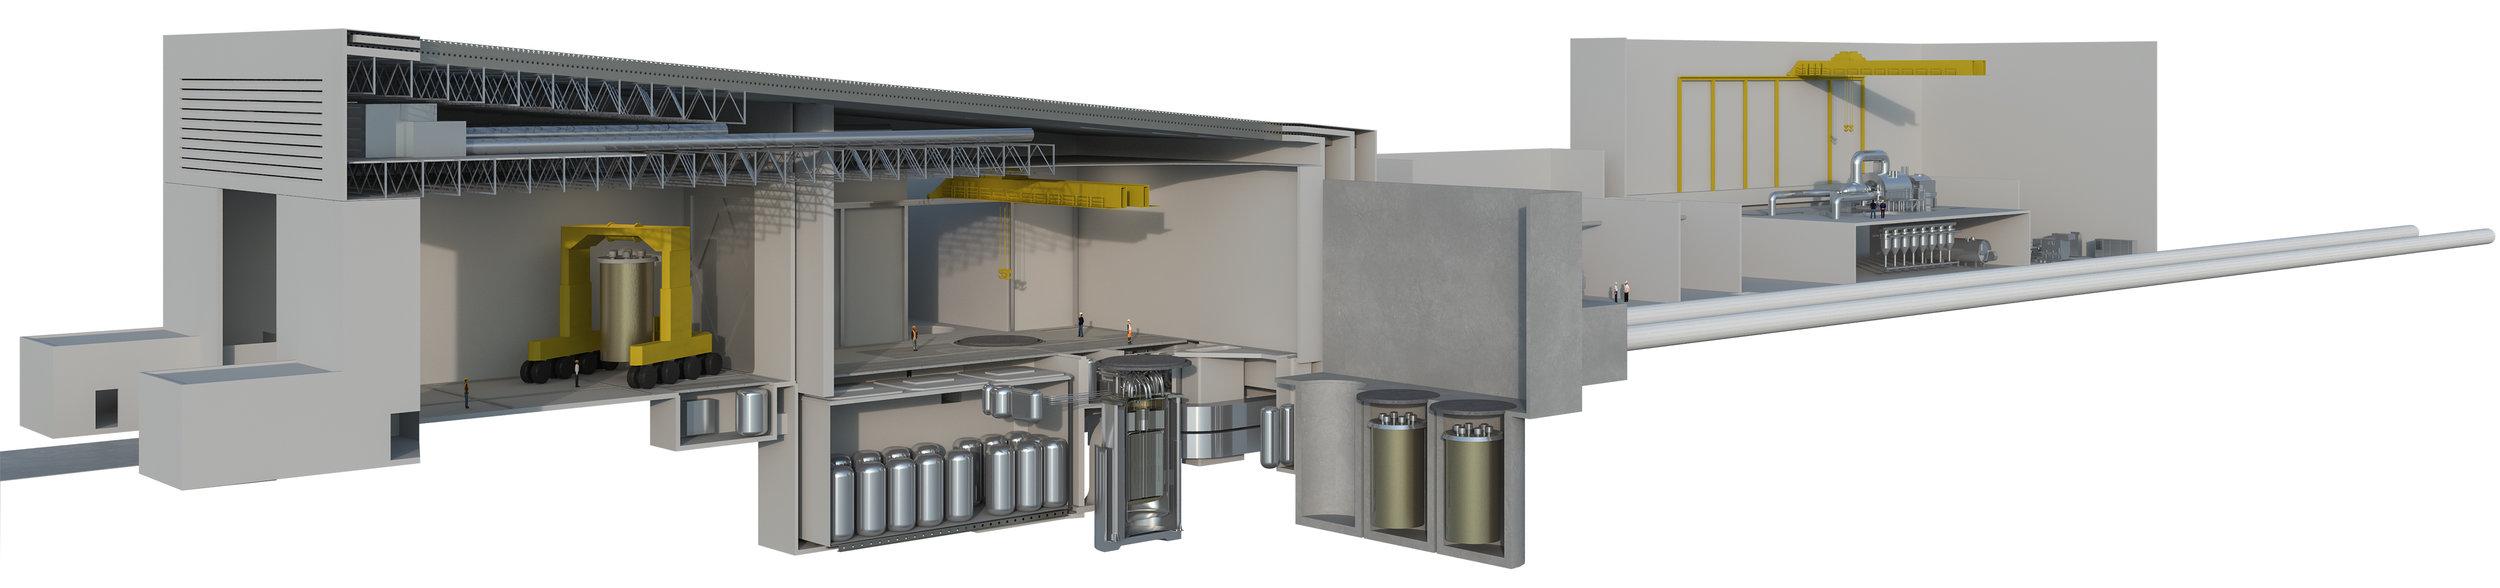 Terrestrial Energy, Integral Molten Salt Reactor. High temperature molten-salt reactor heat plant with sealed, replaceable reactor vessels.